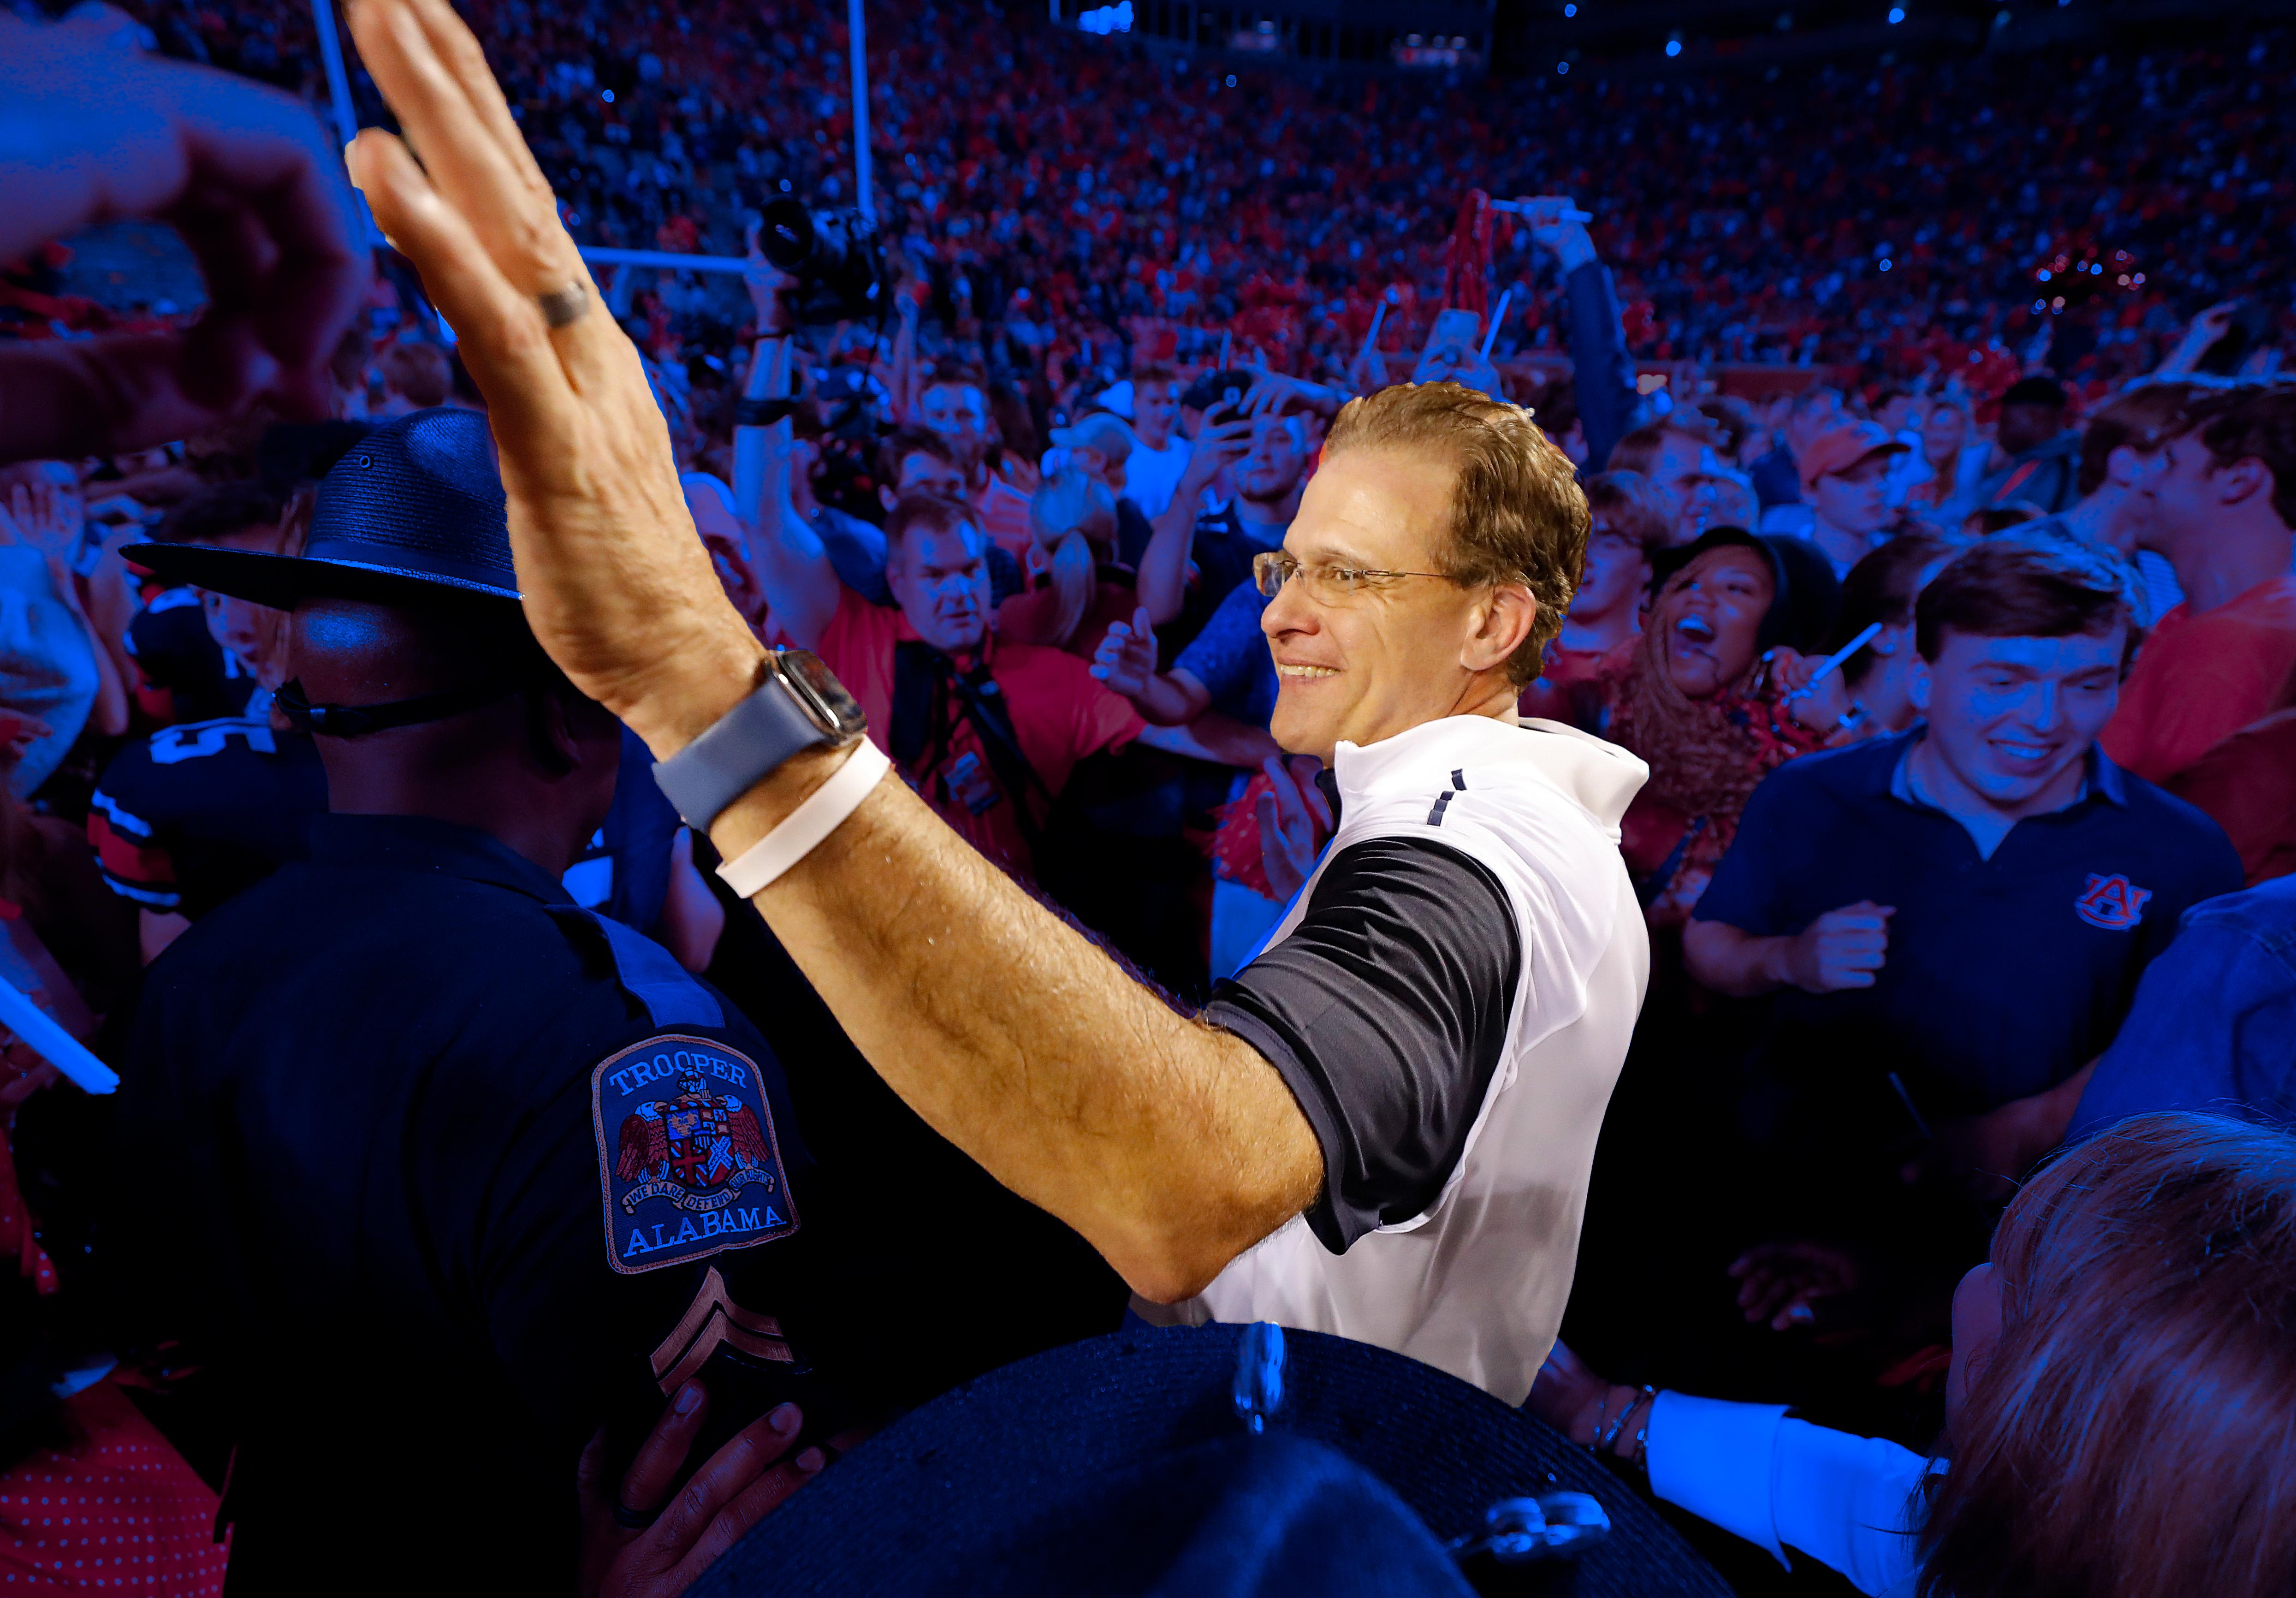 Gus Malzahn celebrates Auburn beating Alabama.